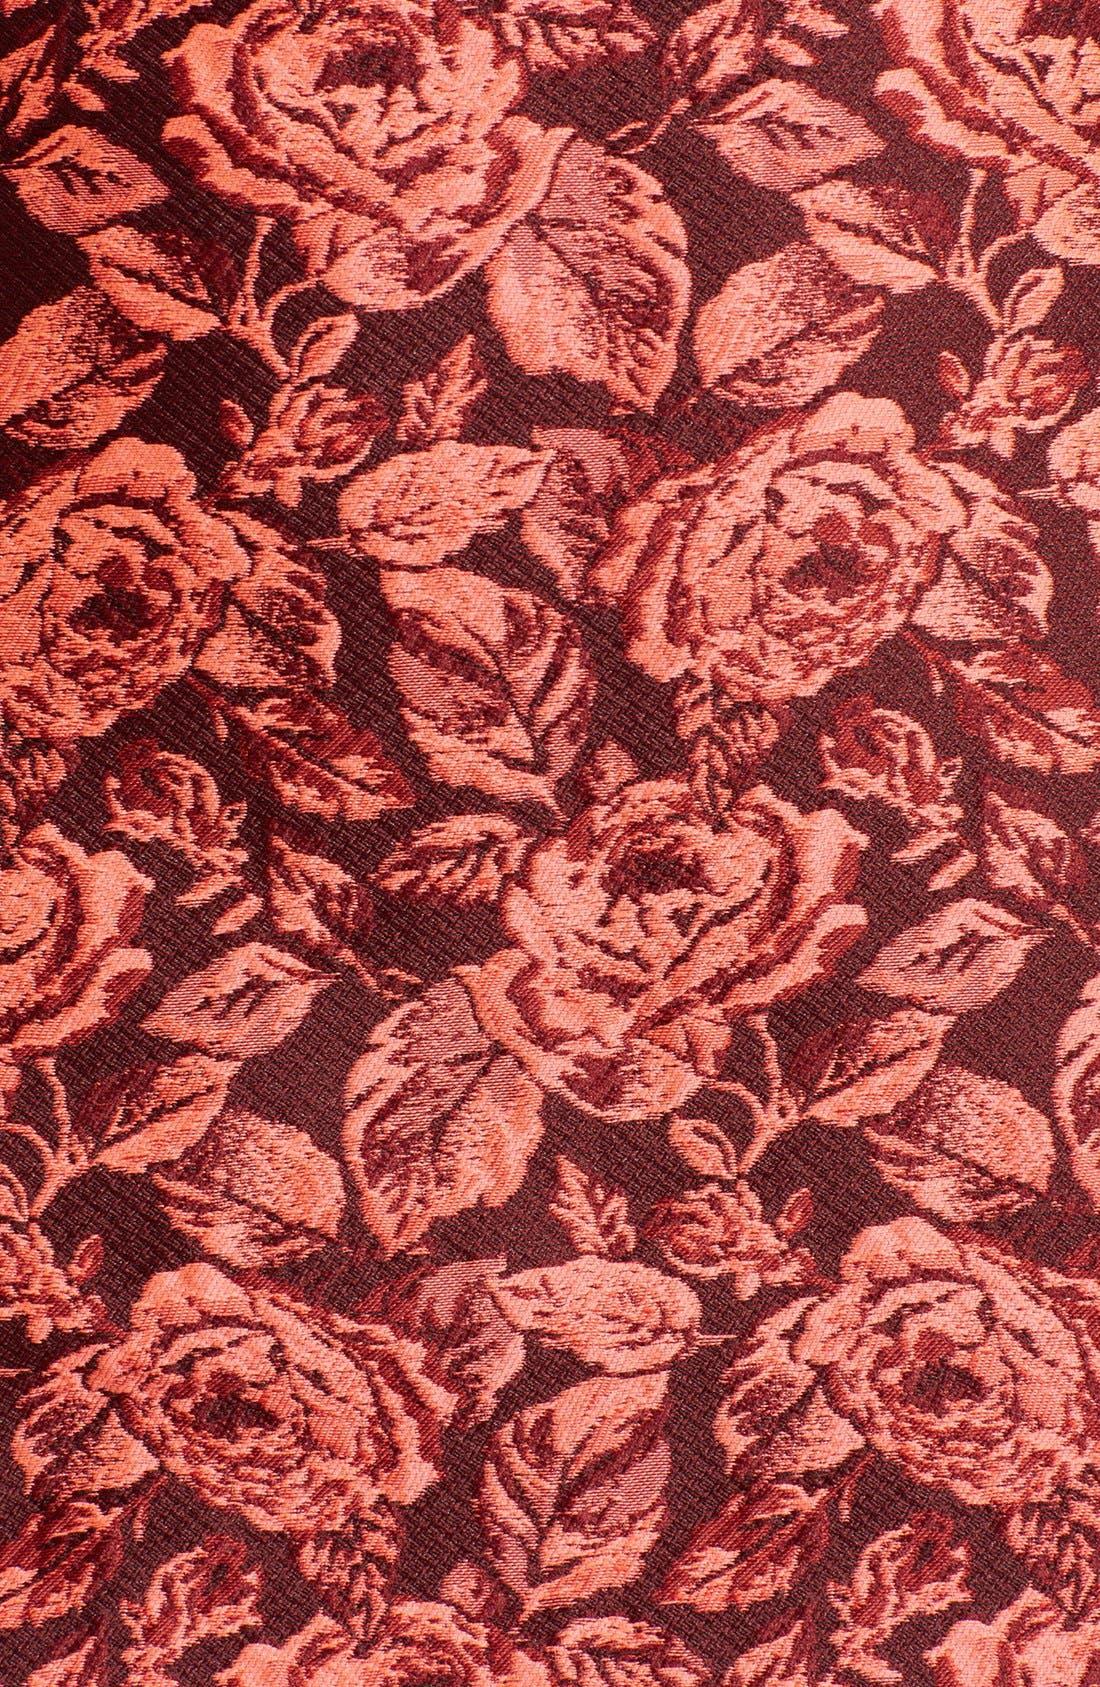 Alternate Image 3  - Erdem Fitted Neon Floral Jacquard Dress